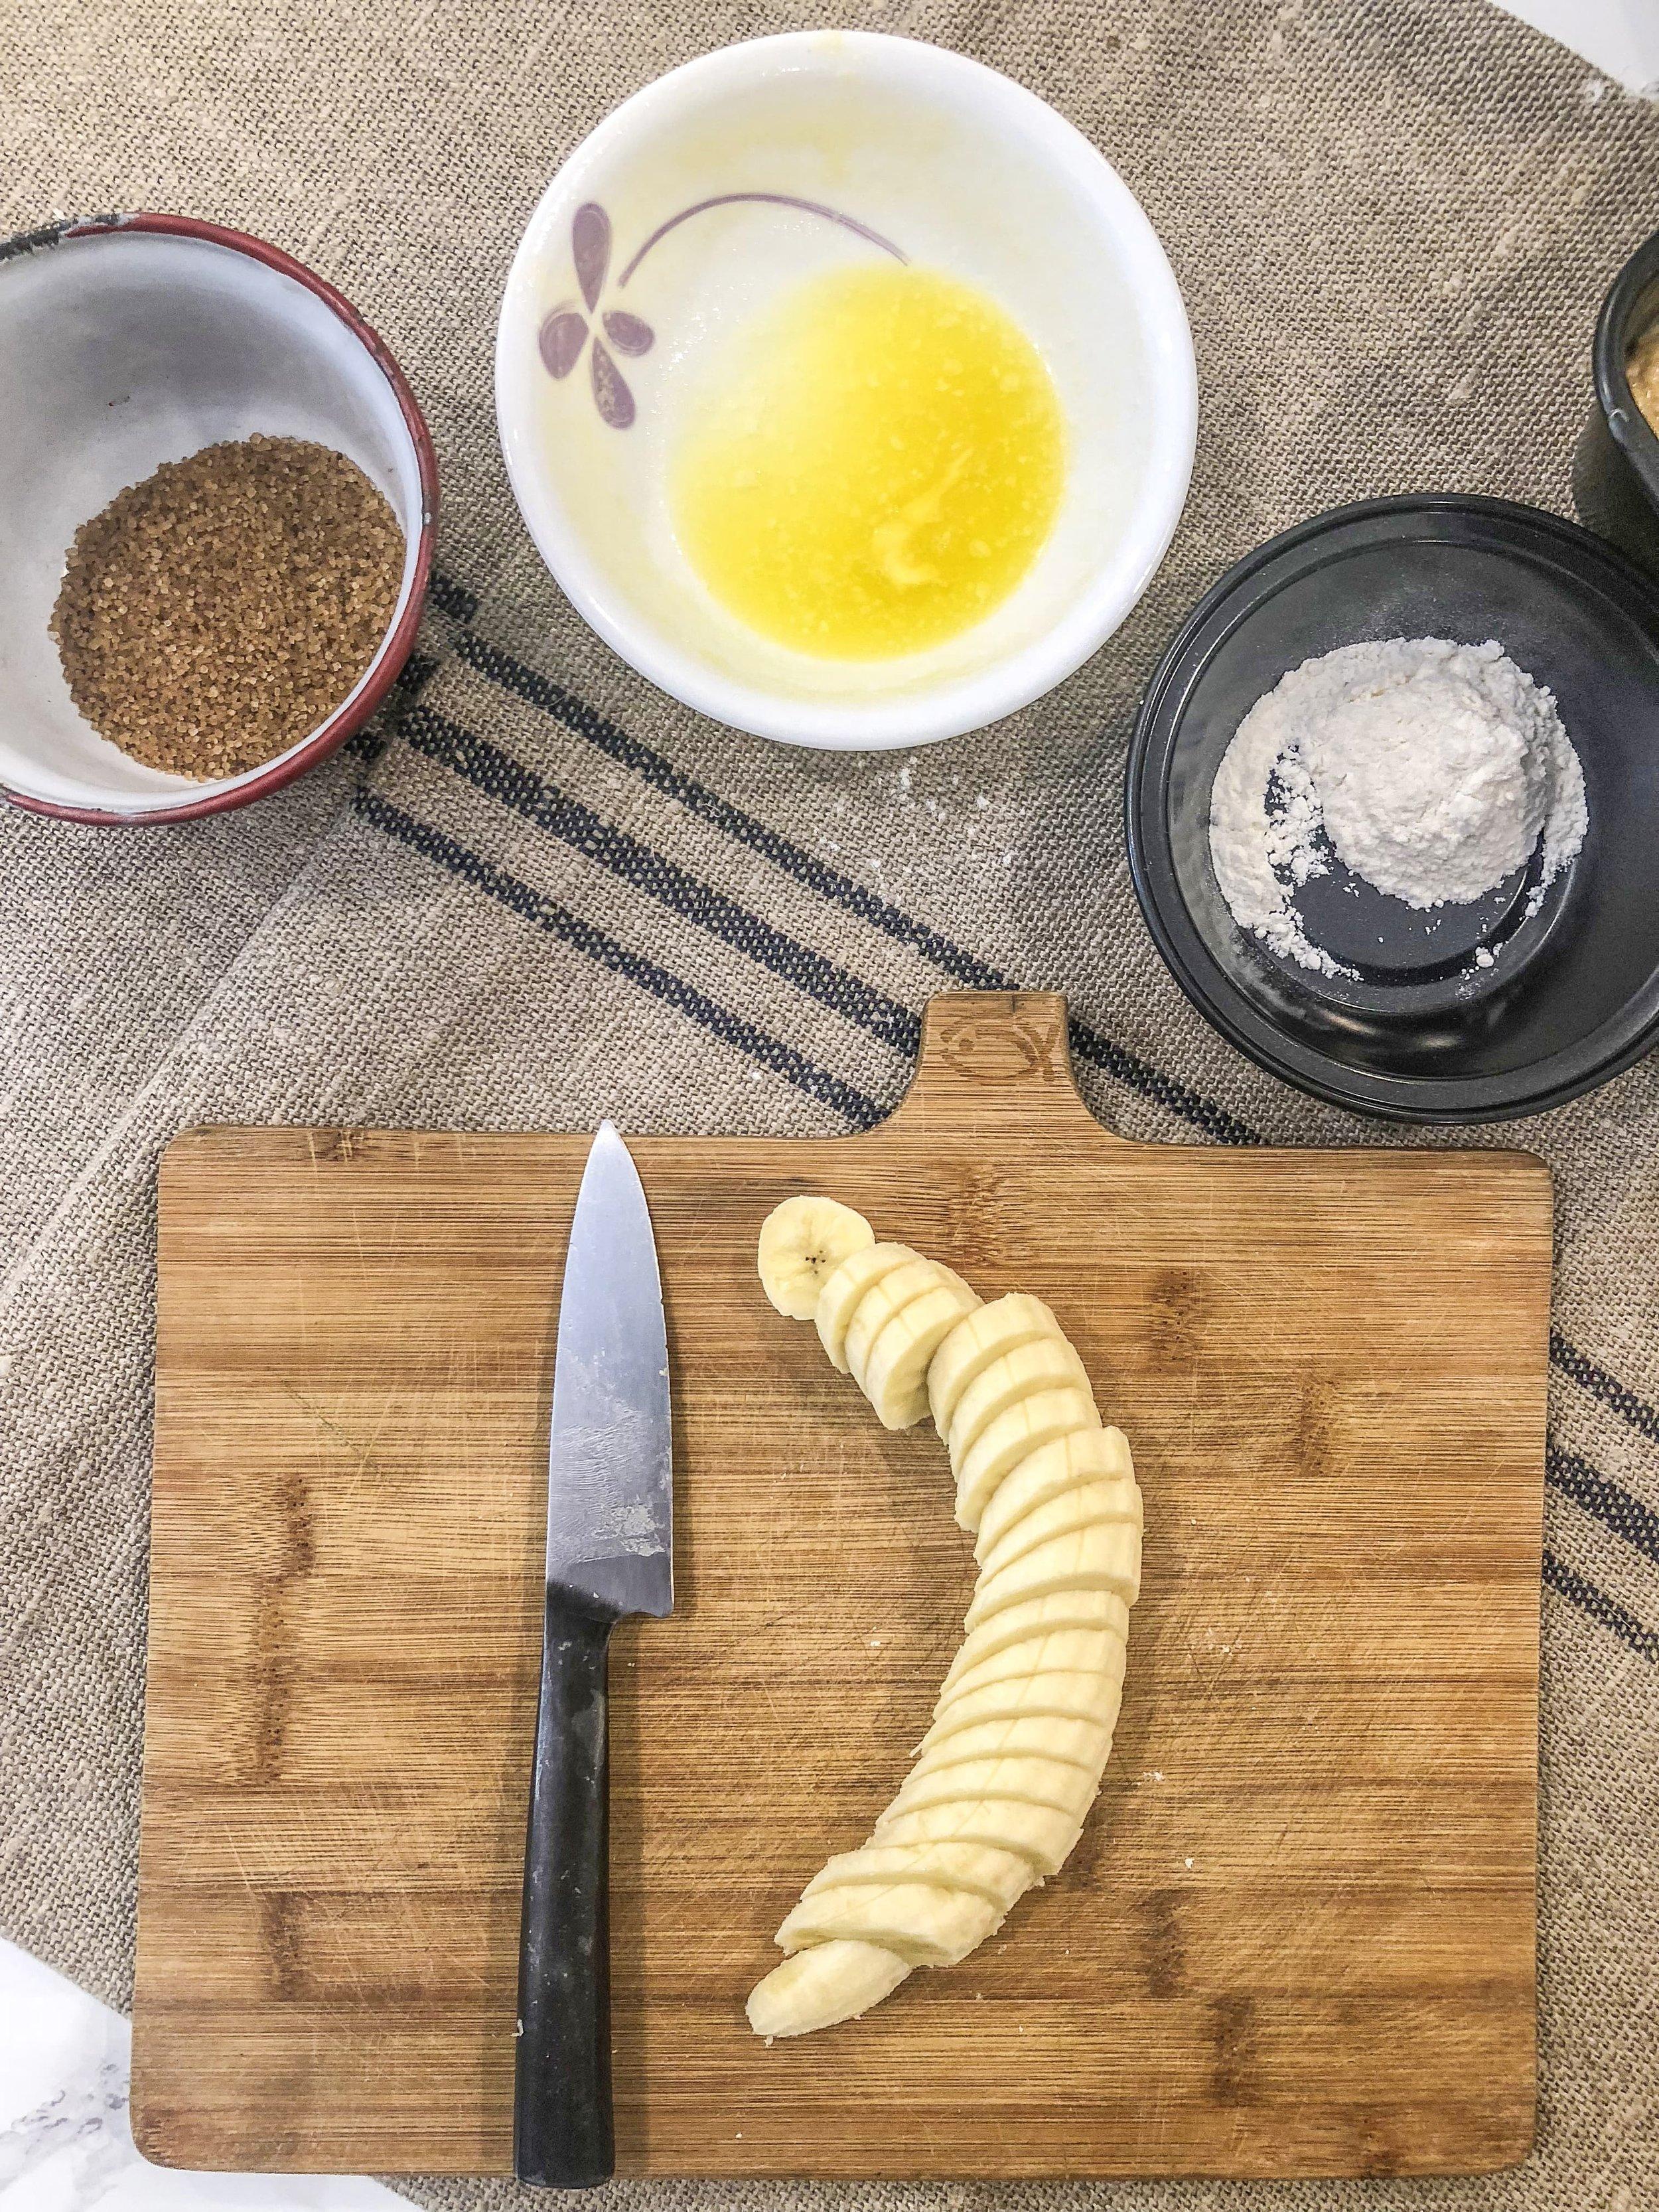 Chop up that extra banana